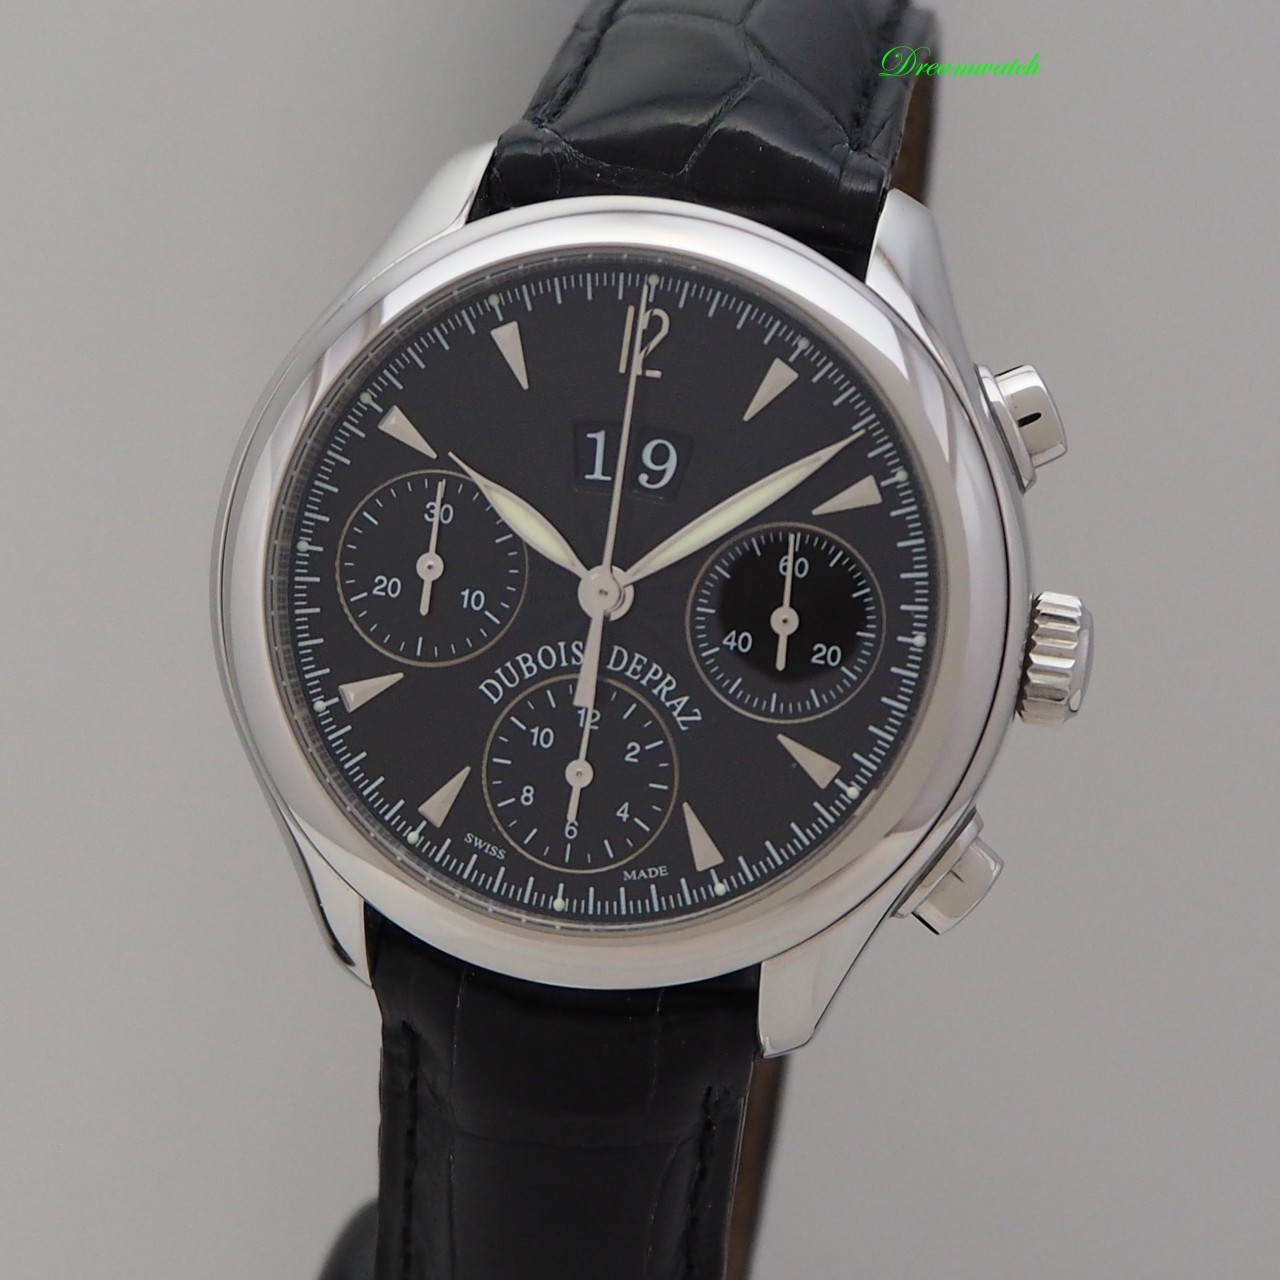 Dubois Depraz Chronograph Grande Date -Limited Edition 100 Jubiläumsuhr